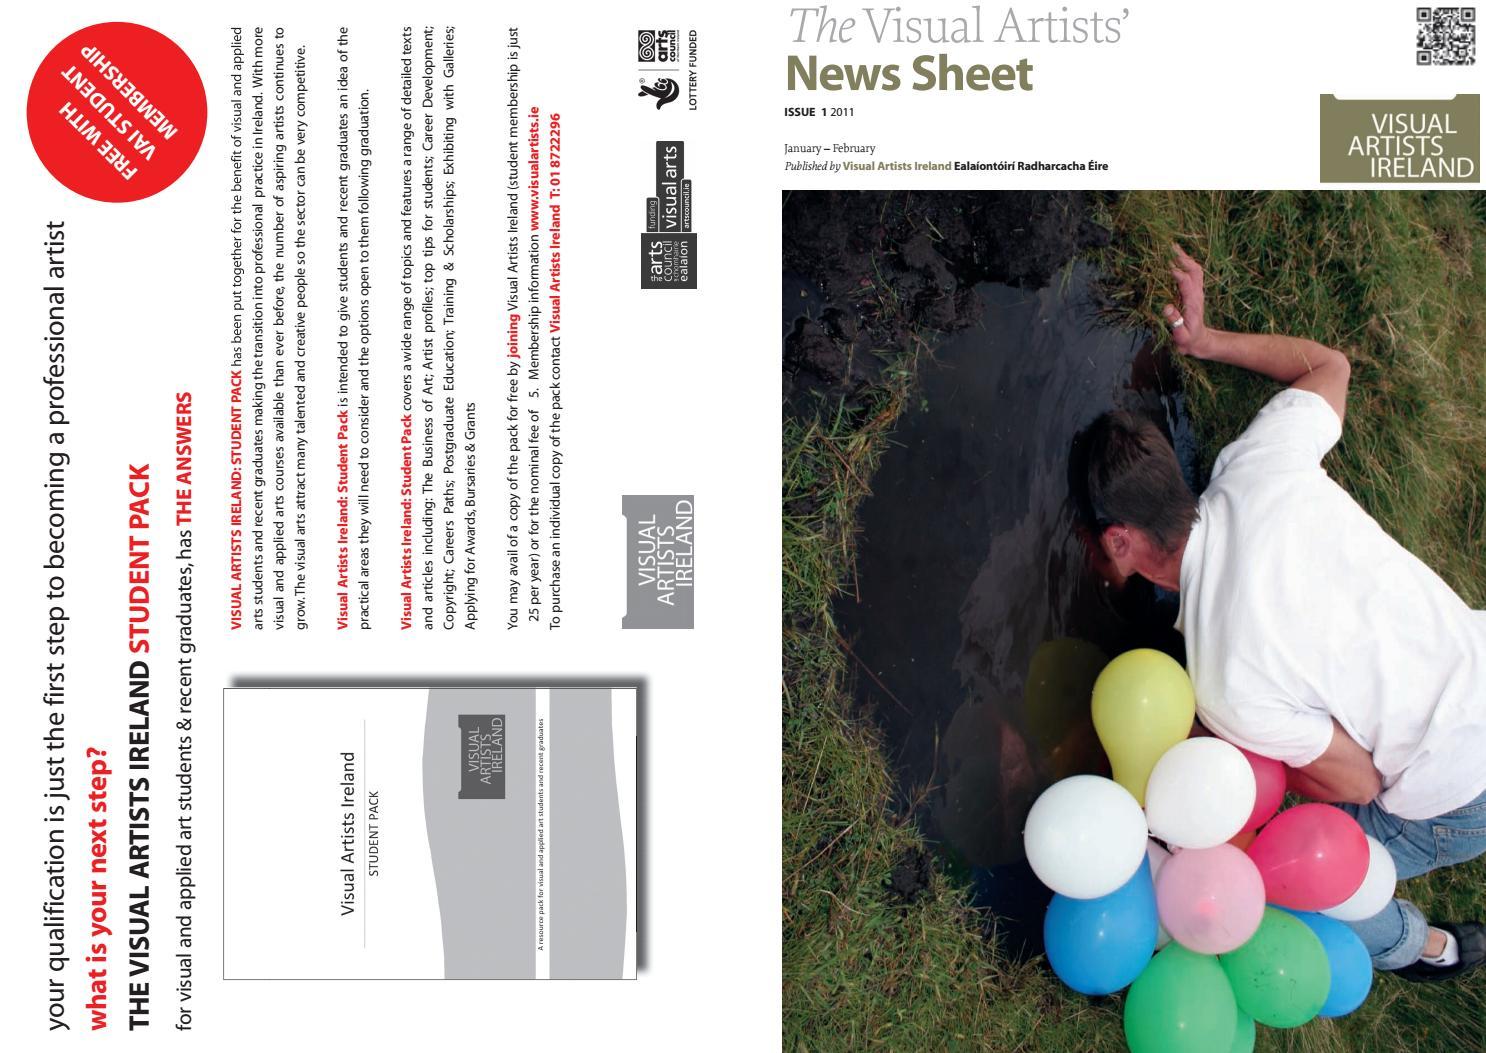 043c12f5be60 Visual Artists  News Sheet - 2011 January February by VisualArtistsIreland  - issuu